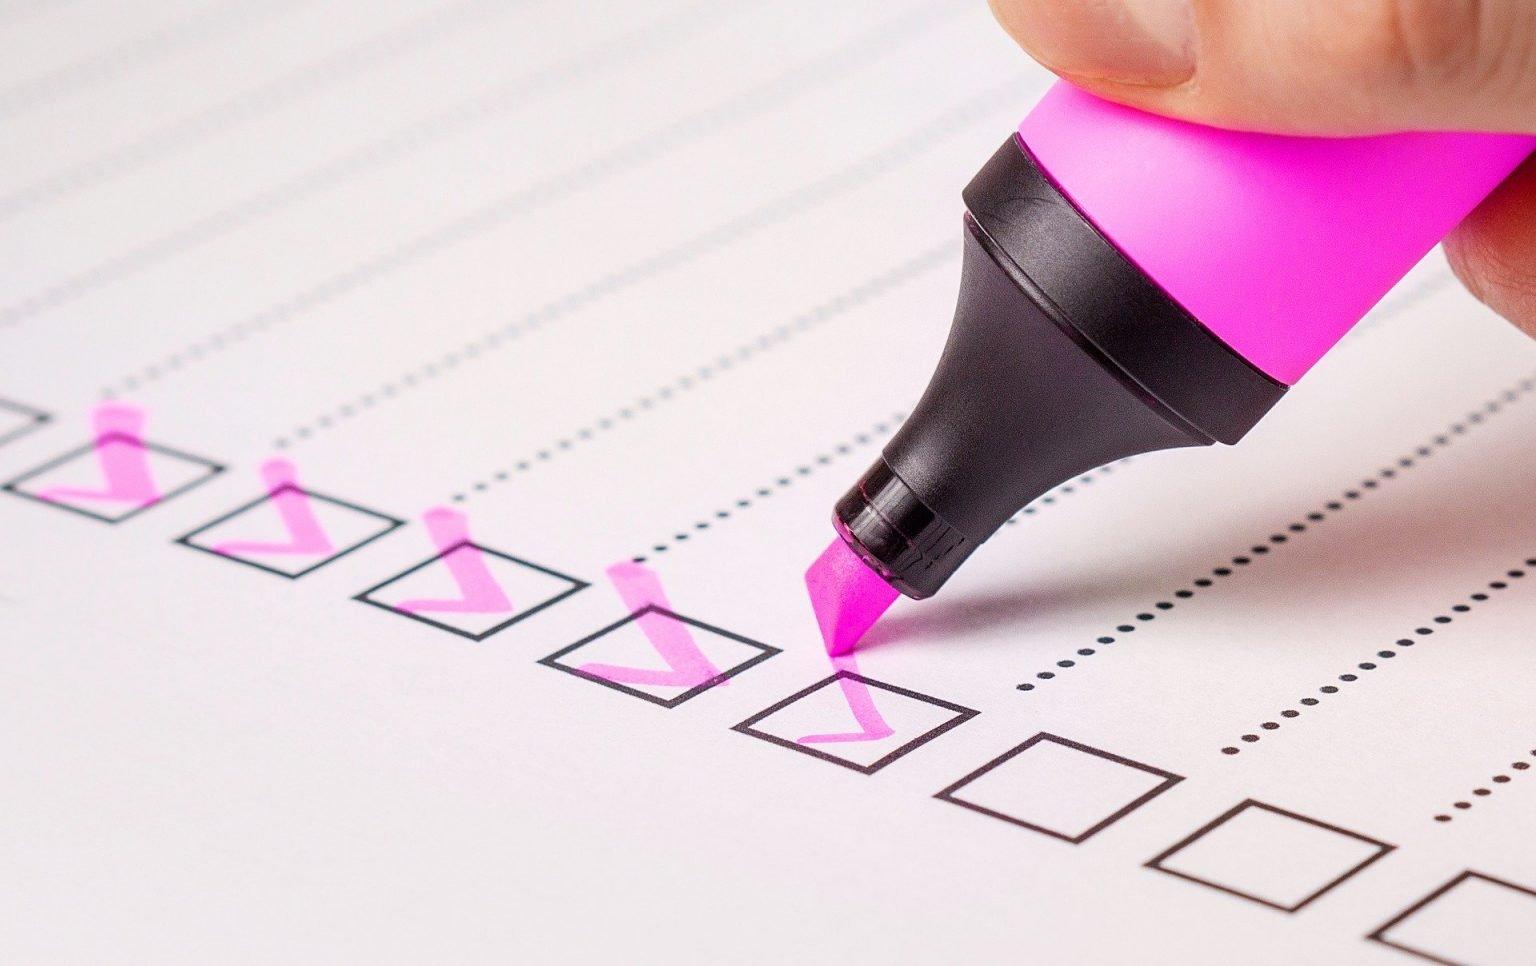 checklist-2077020_1920-1536x9662123720440.jpg